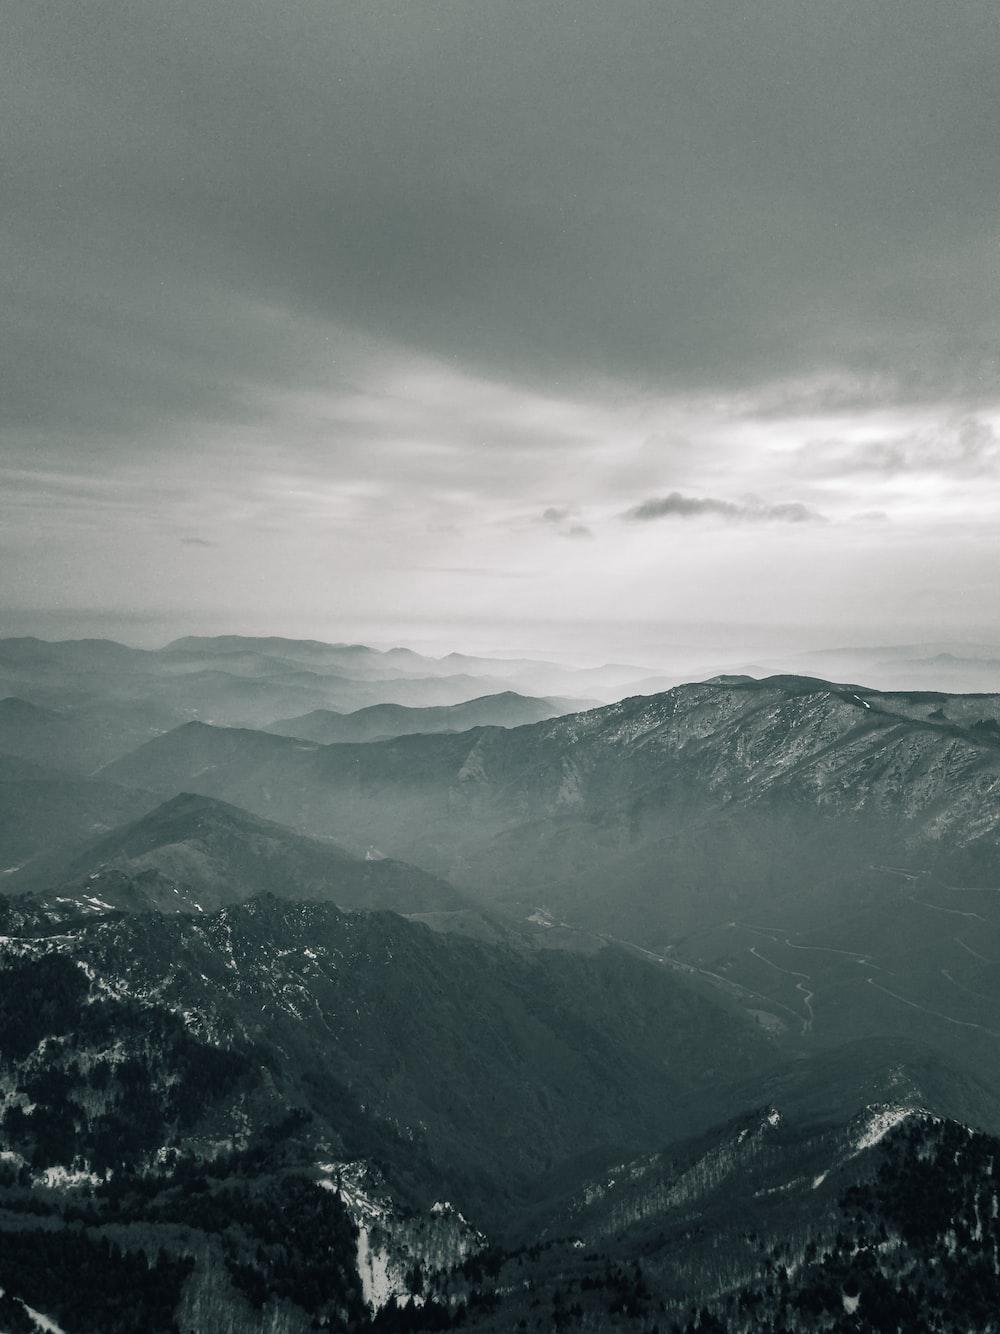 black rocky mountain during daytime